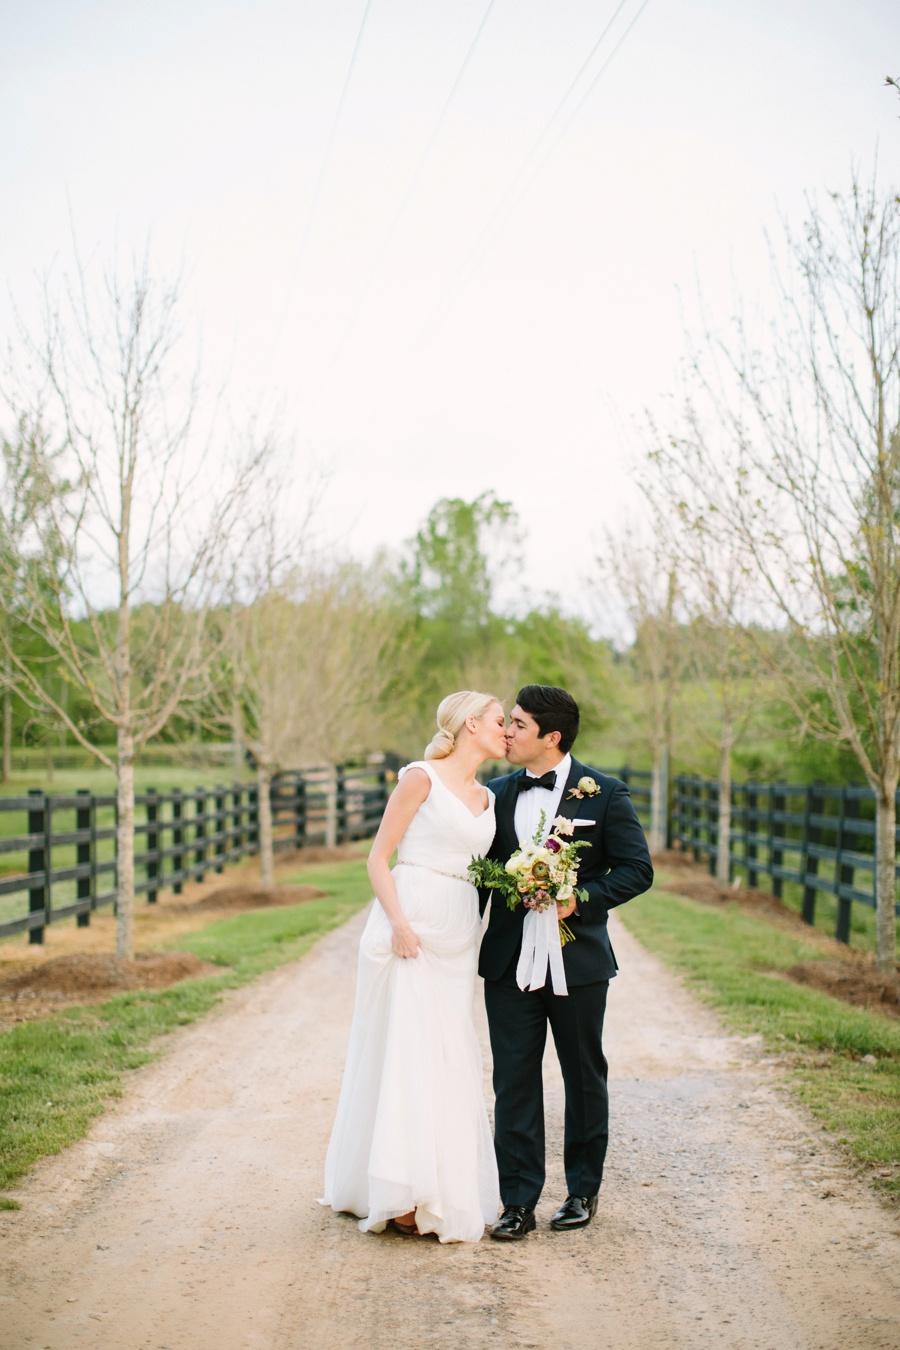 Augusta Aiken Charleston Hilton Head Savannah Atlanta Athens wedding photographer_0022.jpg